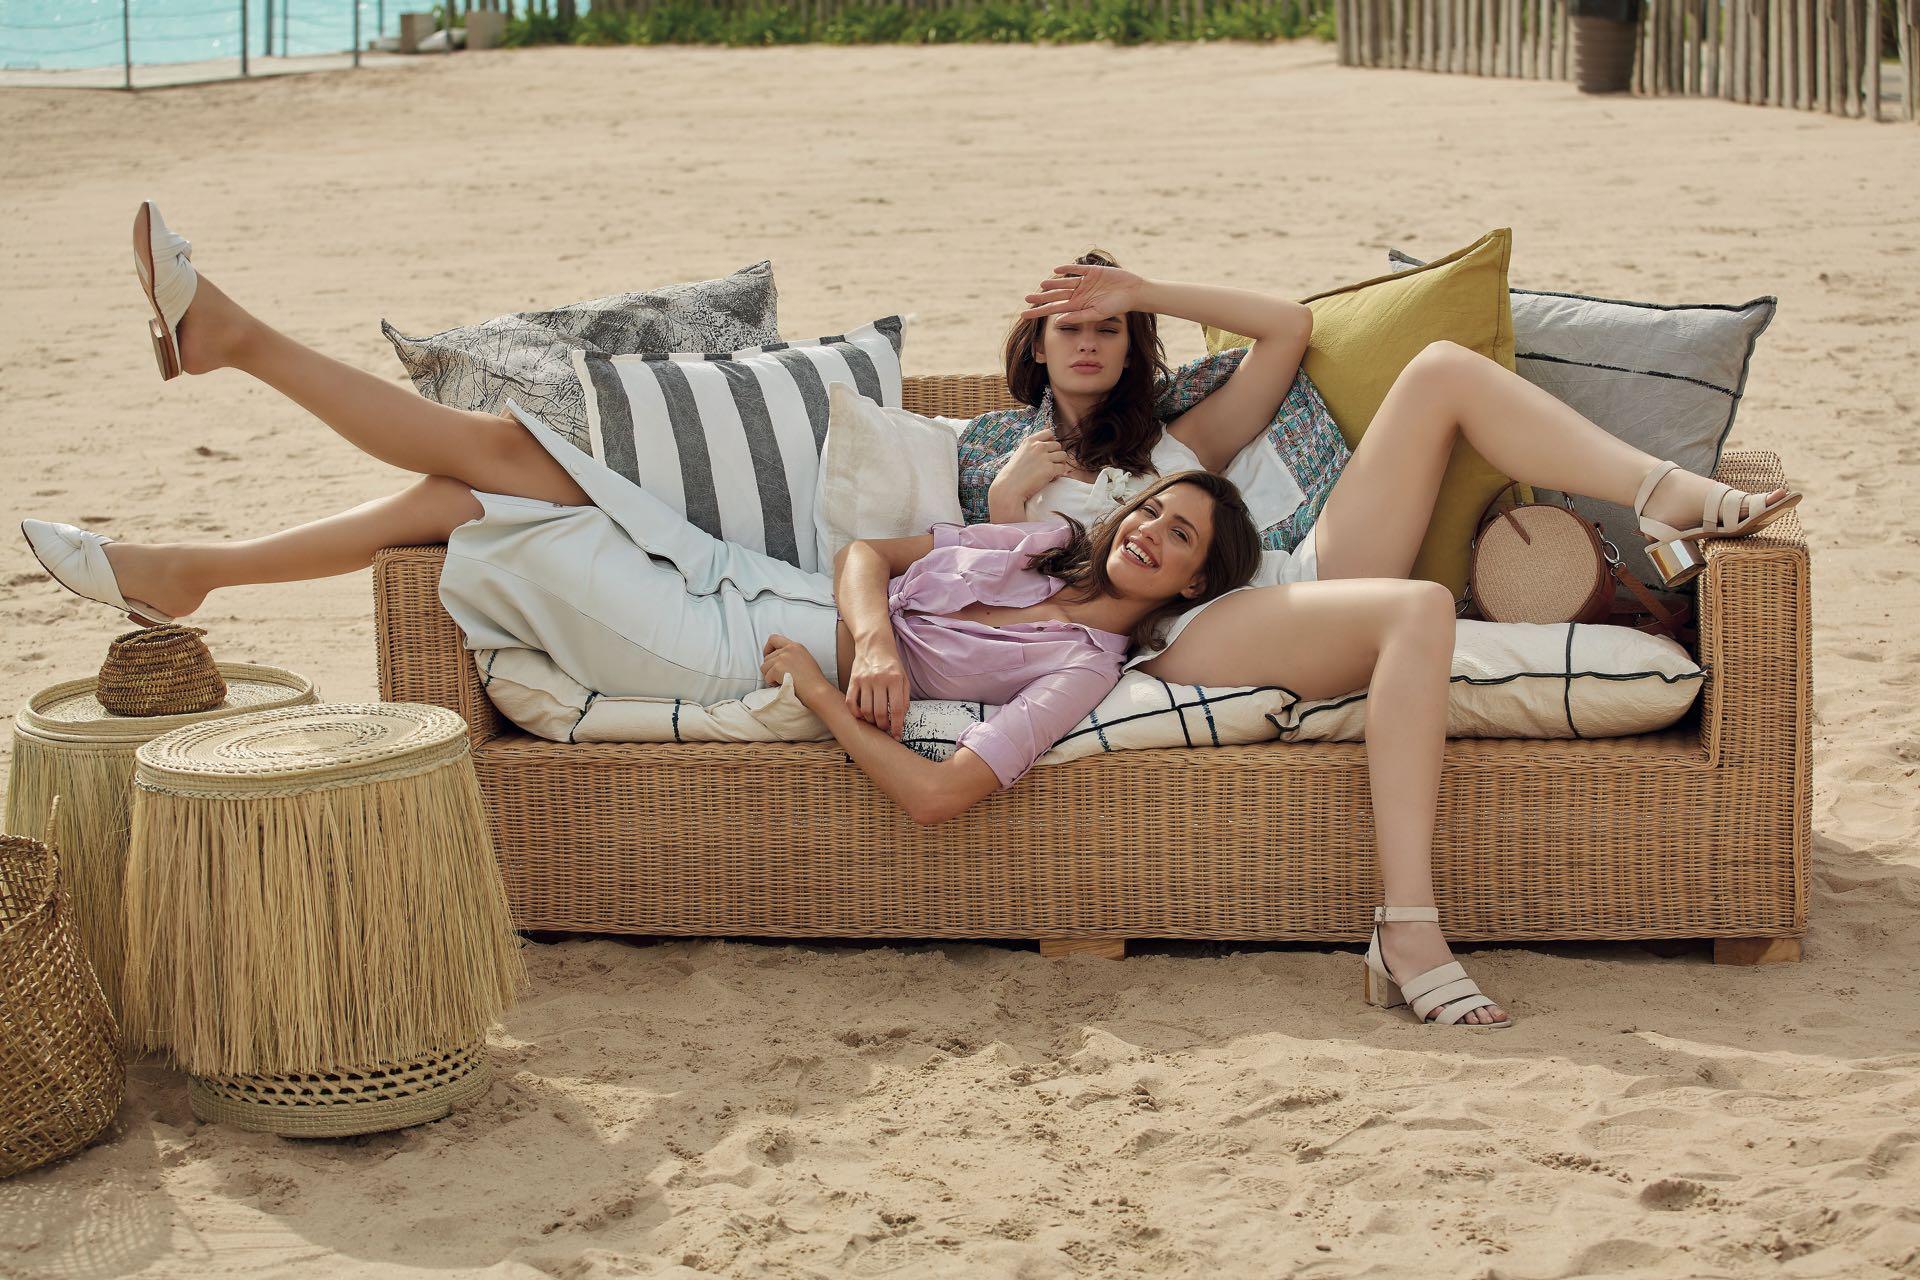 Luisi: camisa de poplín (Ted Bodin), pollera de cuero (Cher) y slippers de cuero ($ 6.500, Carmela Achaval). Stefi: mono con glitter ($ 1.940, Zhoue), sandalias de gamuza con pulsera ($ 6.749, Paruolo) y bandolera de rafia con cuero ($ 4.250, Sofi Martiré).